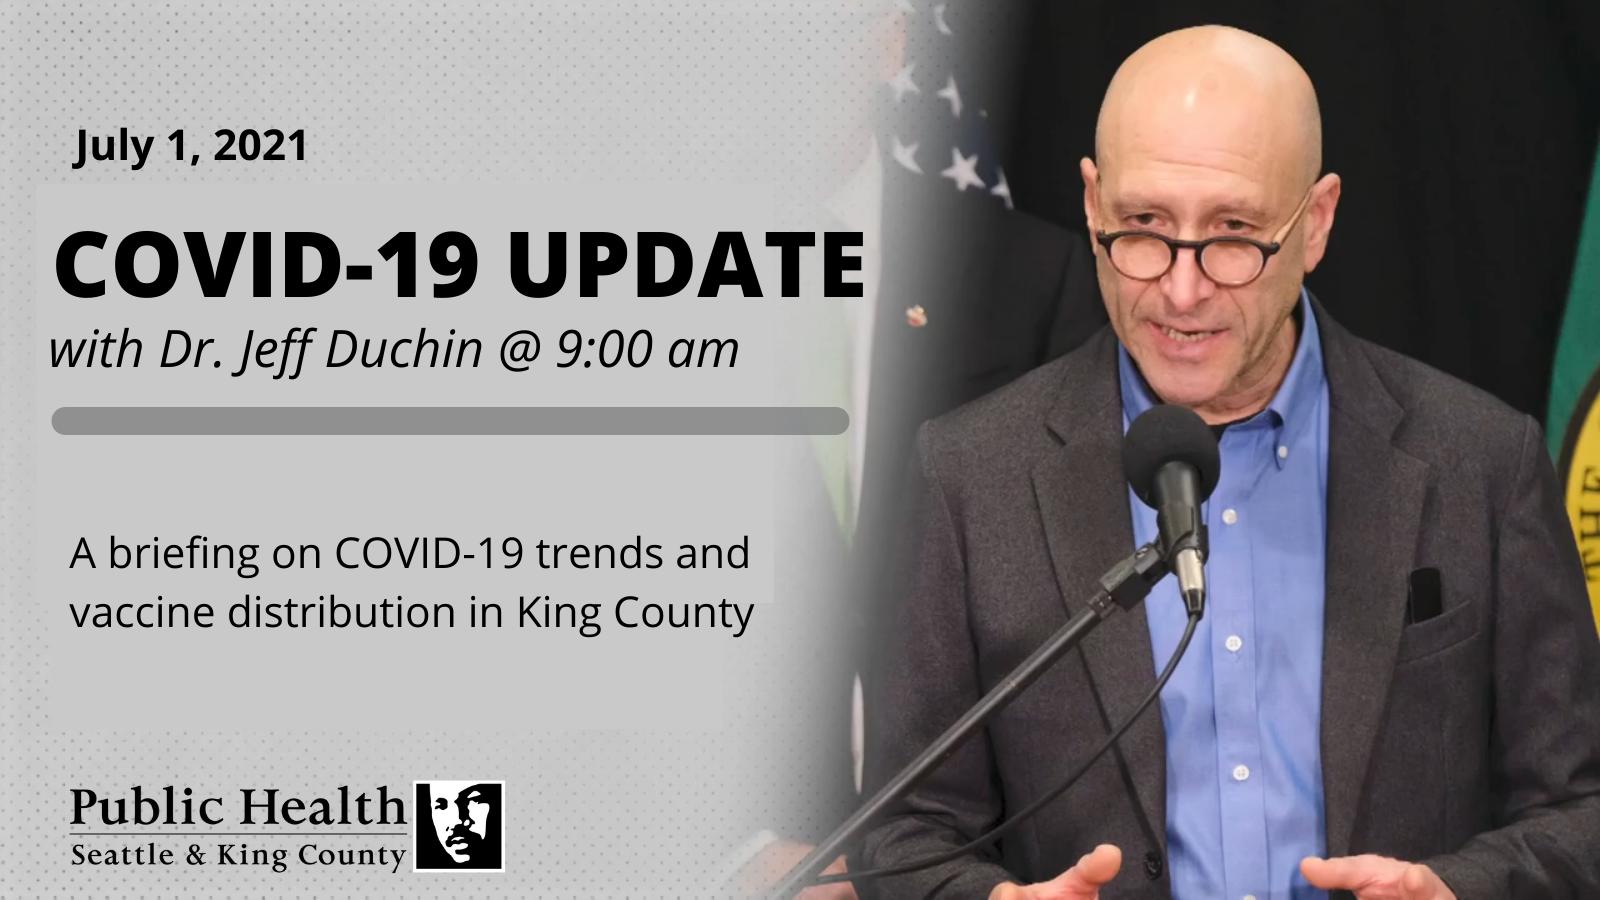 JEFF DUCHIN'S COVID-19 PRESS REPORT – July 1, 2021 – PUBLIC HEALTH INSIDER